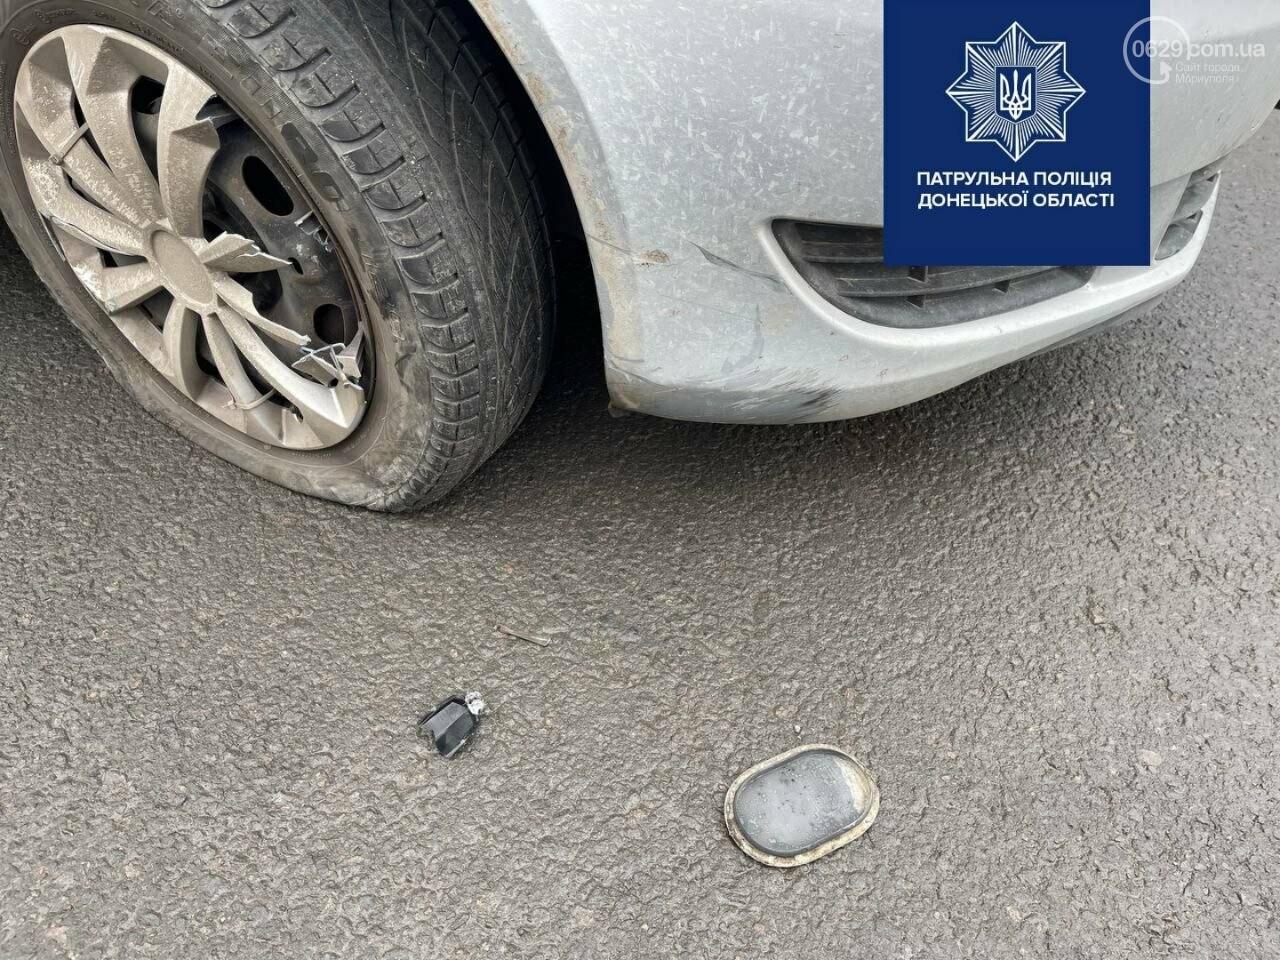 В Мариуполе ребёнок на квадроцикле попал под  колеса авто,- ФОТО, фото-1